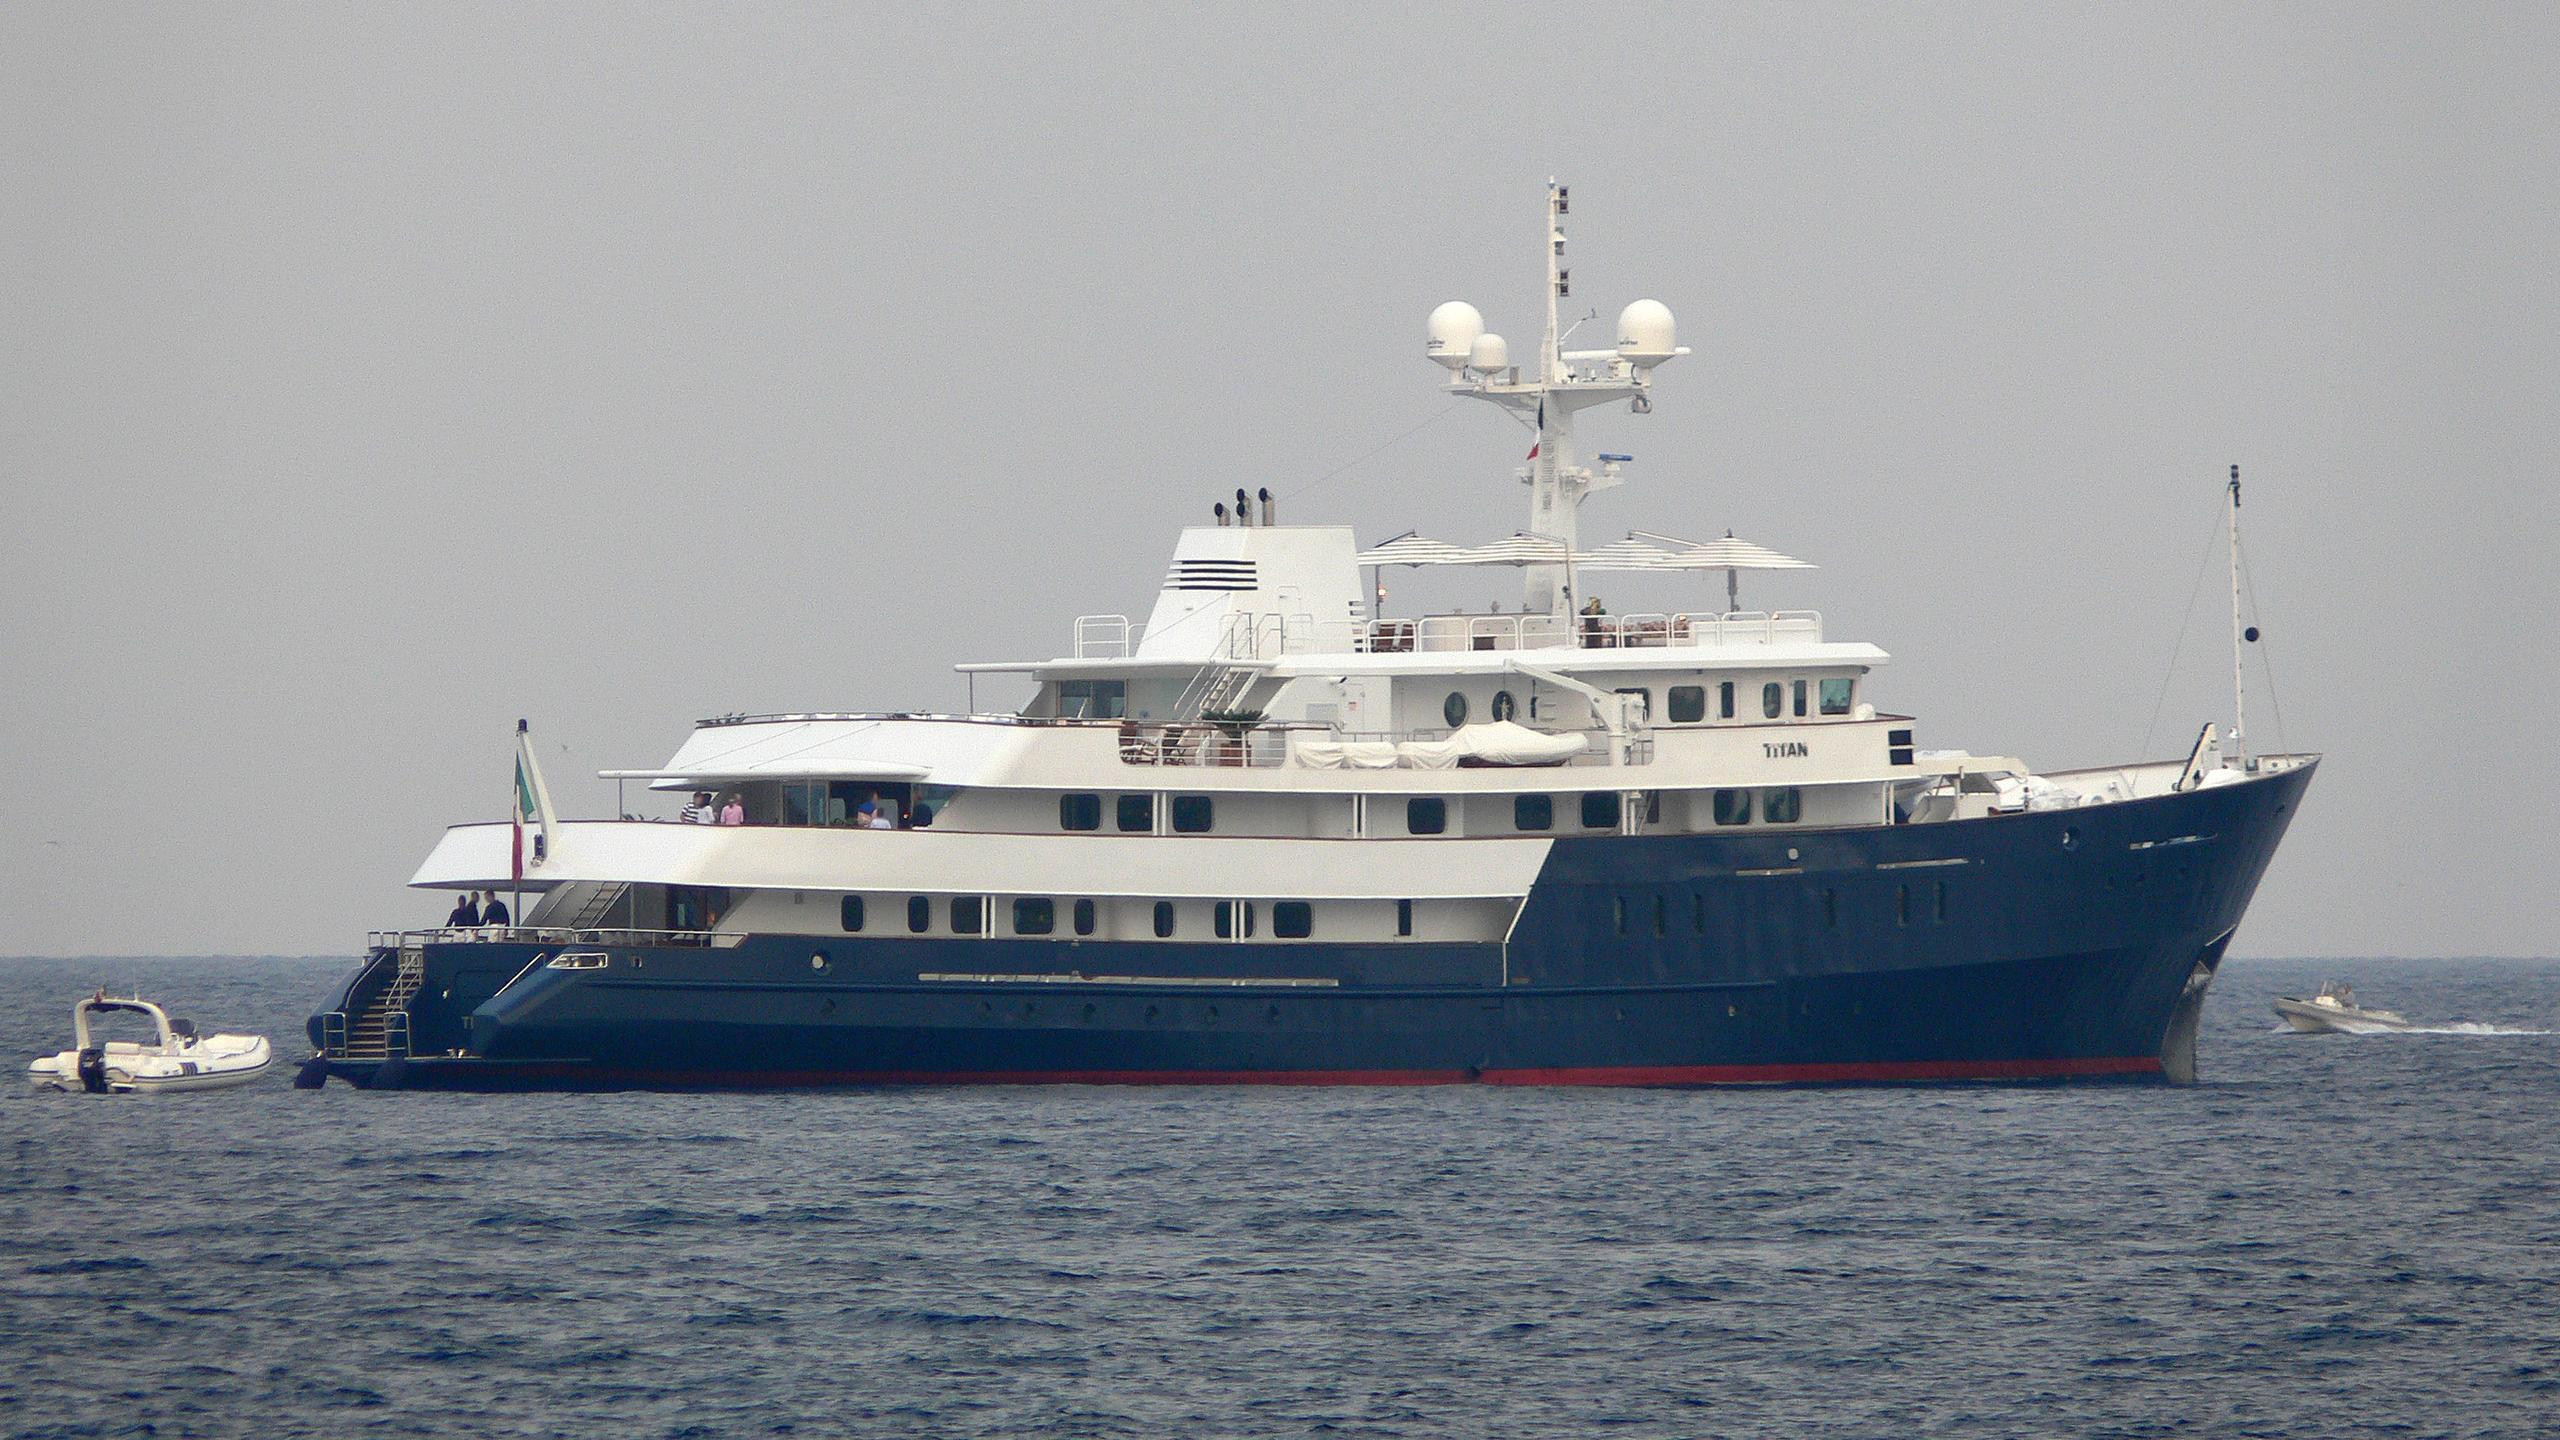 titan-half-explorer-yacht-brooke-1968-60m-profile